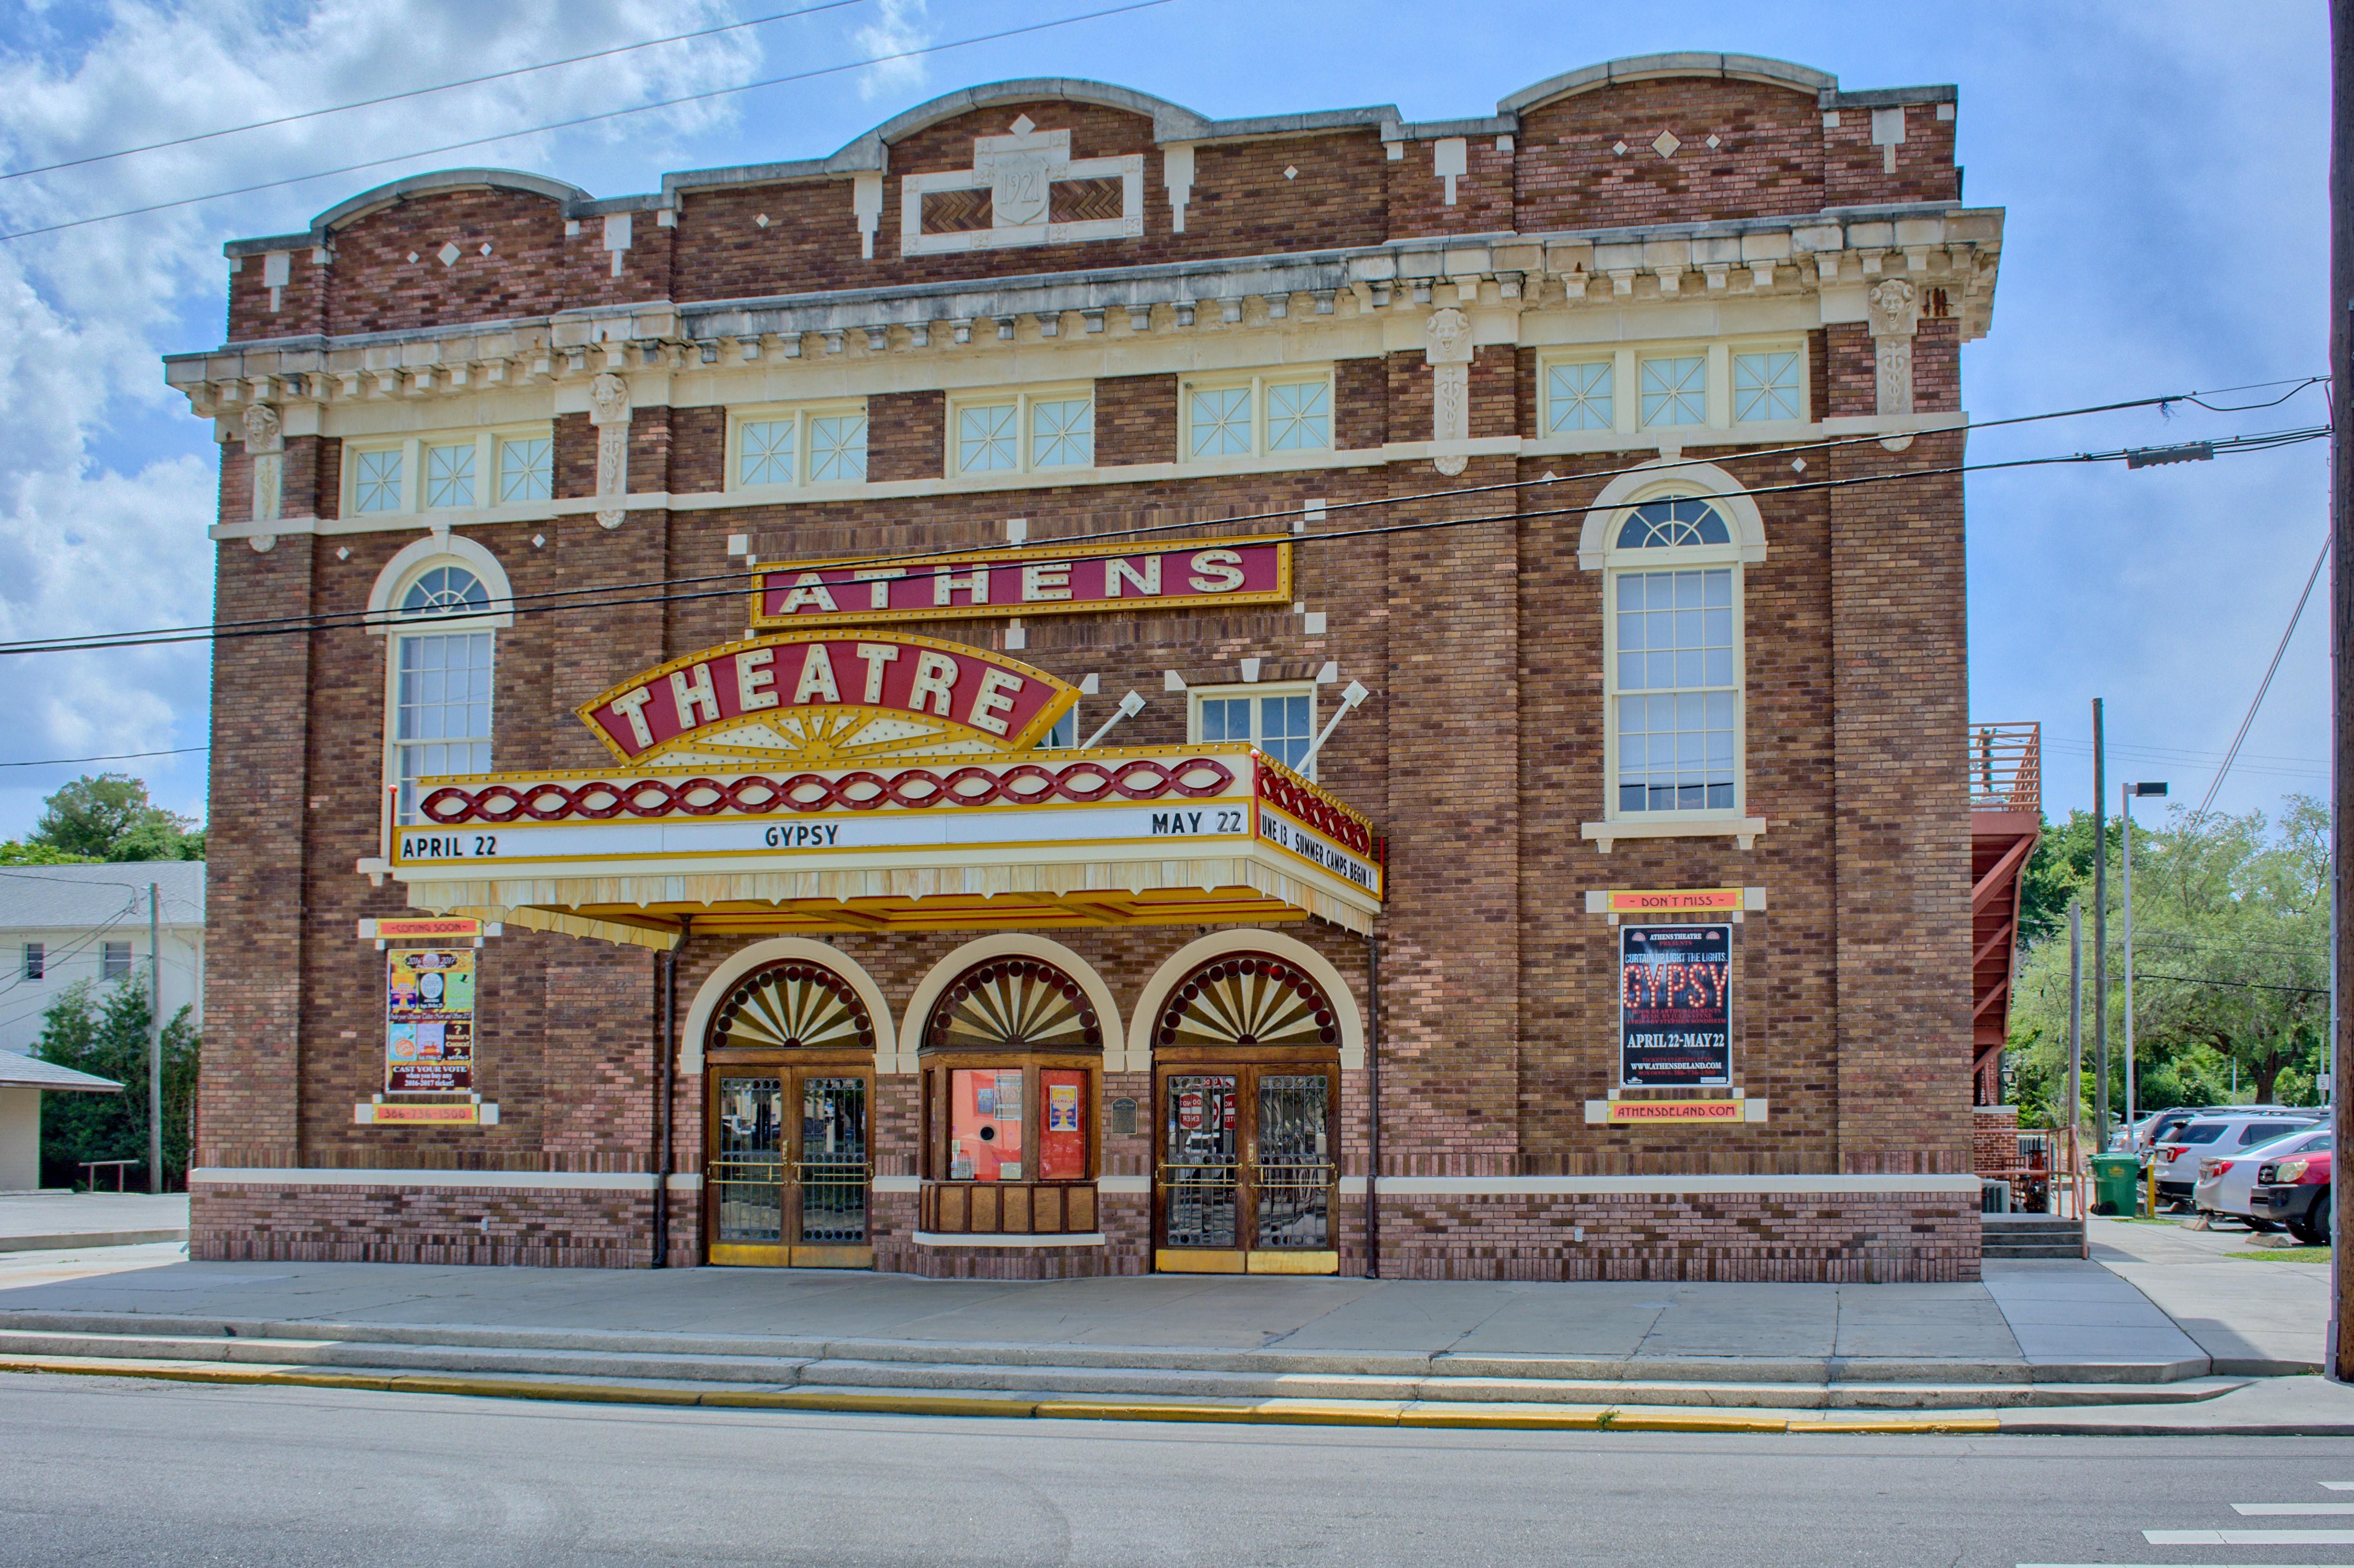 deland_athens theatre